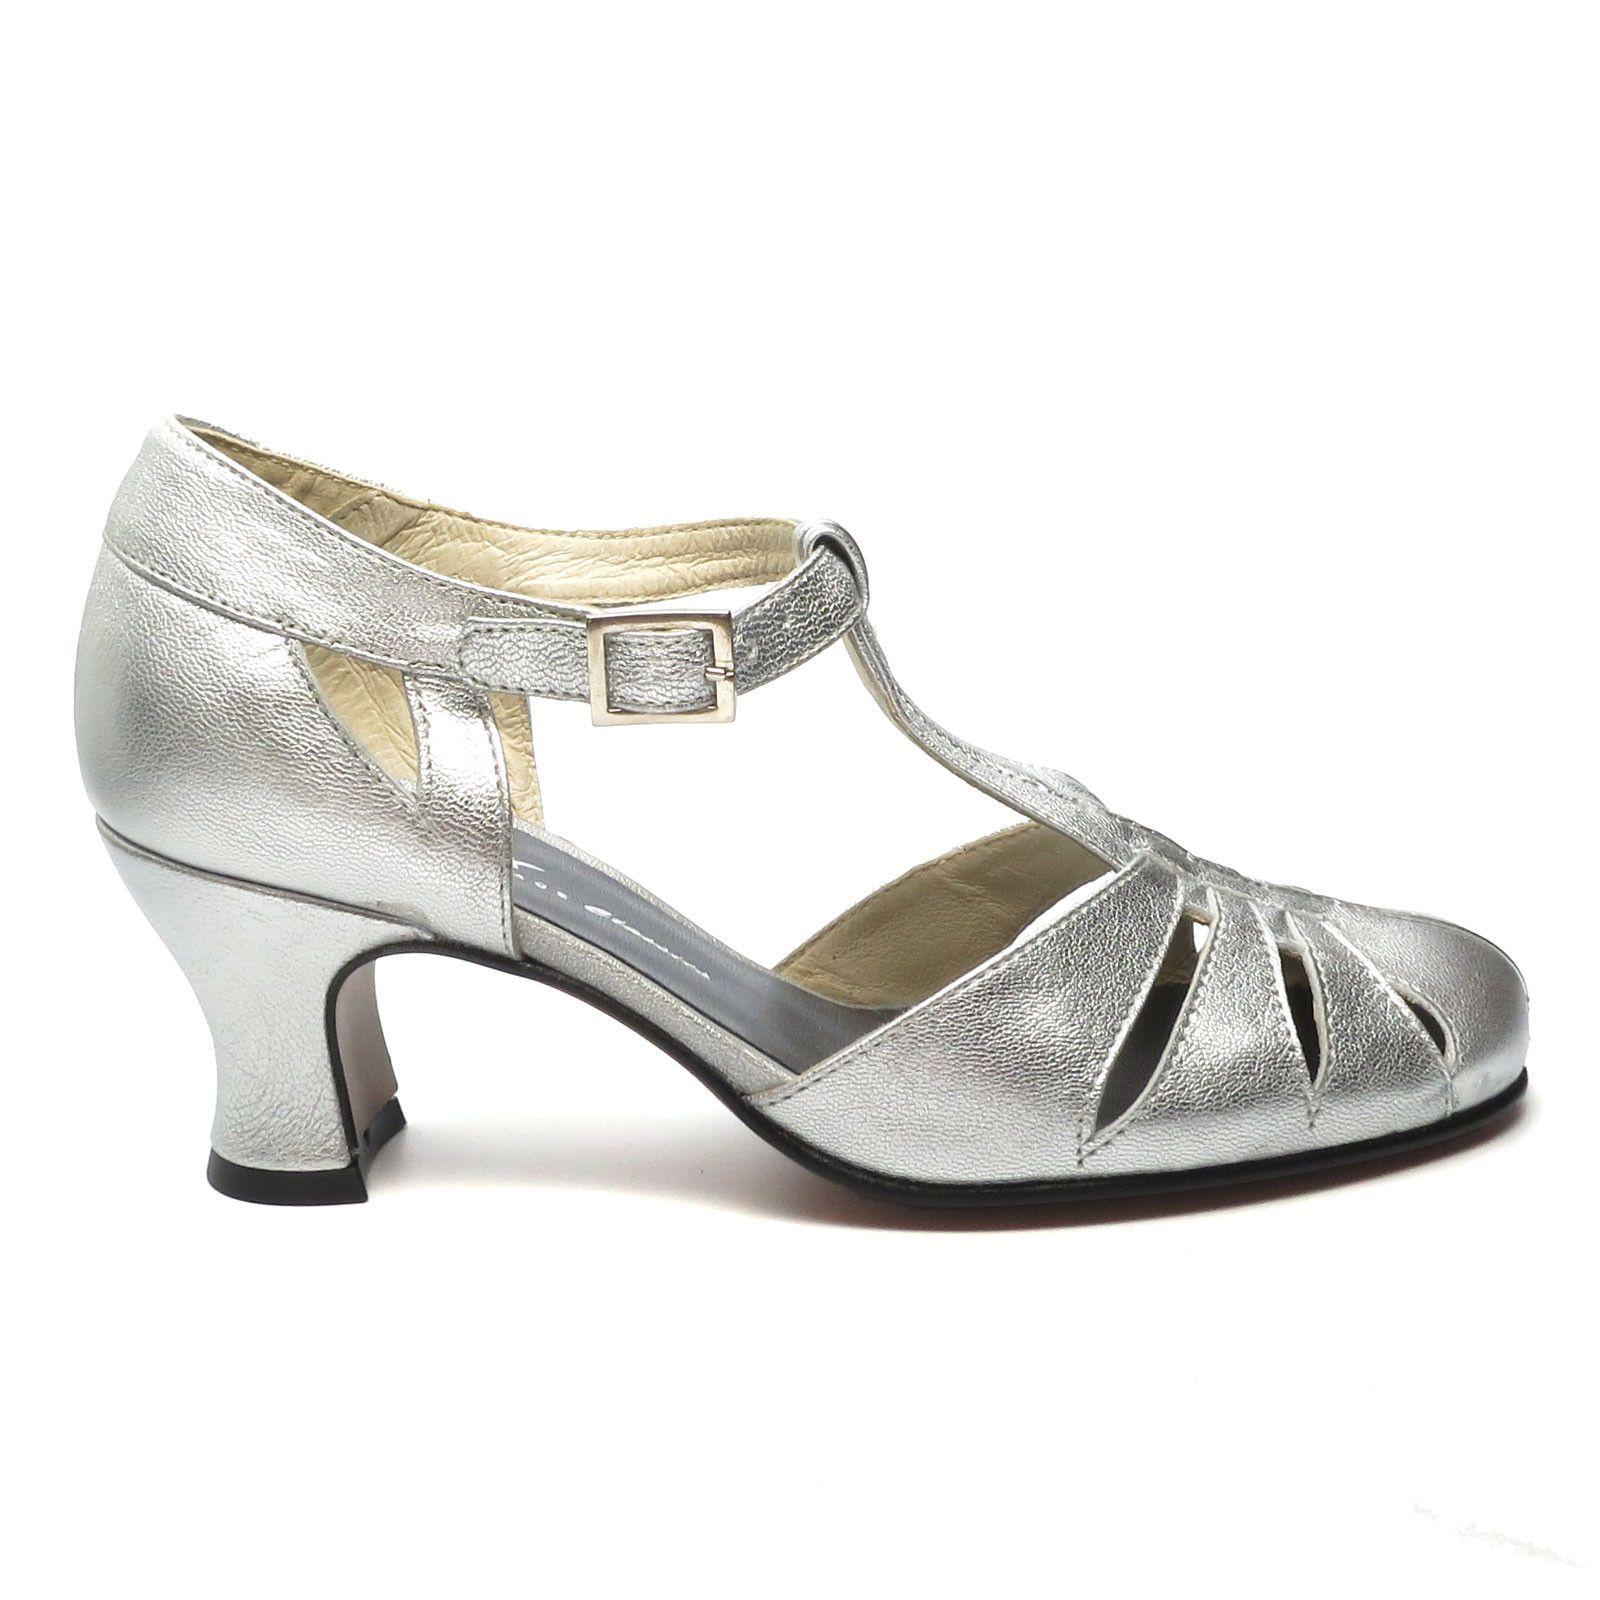 Balboa Metallics Vintage High Heels Swing Dance Shoes Heels